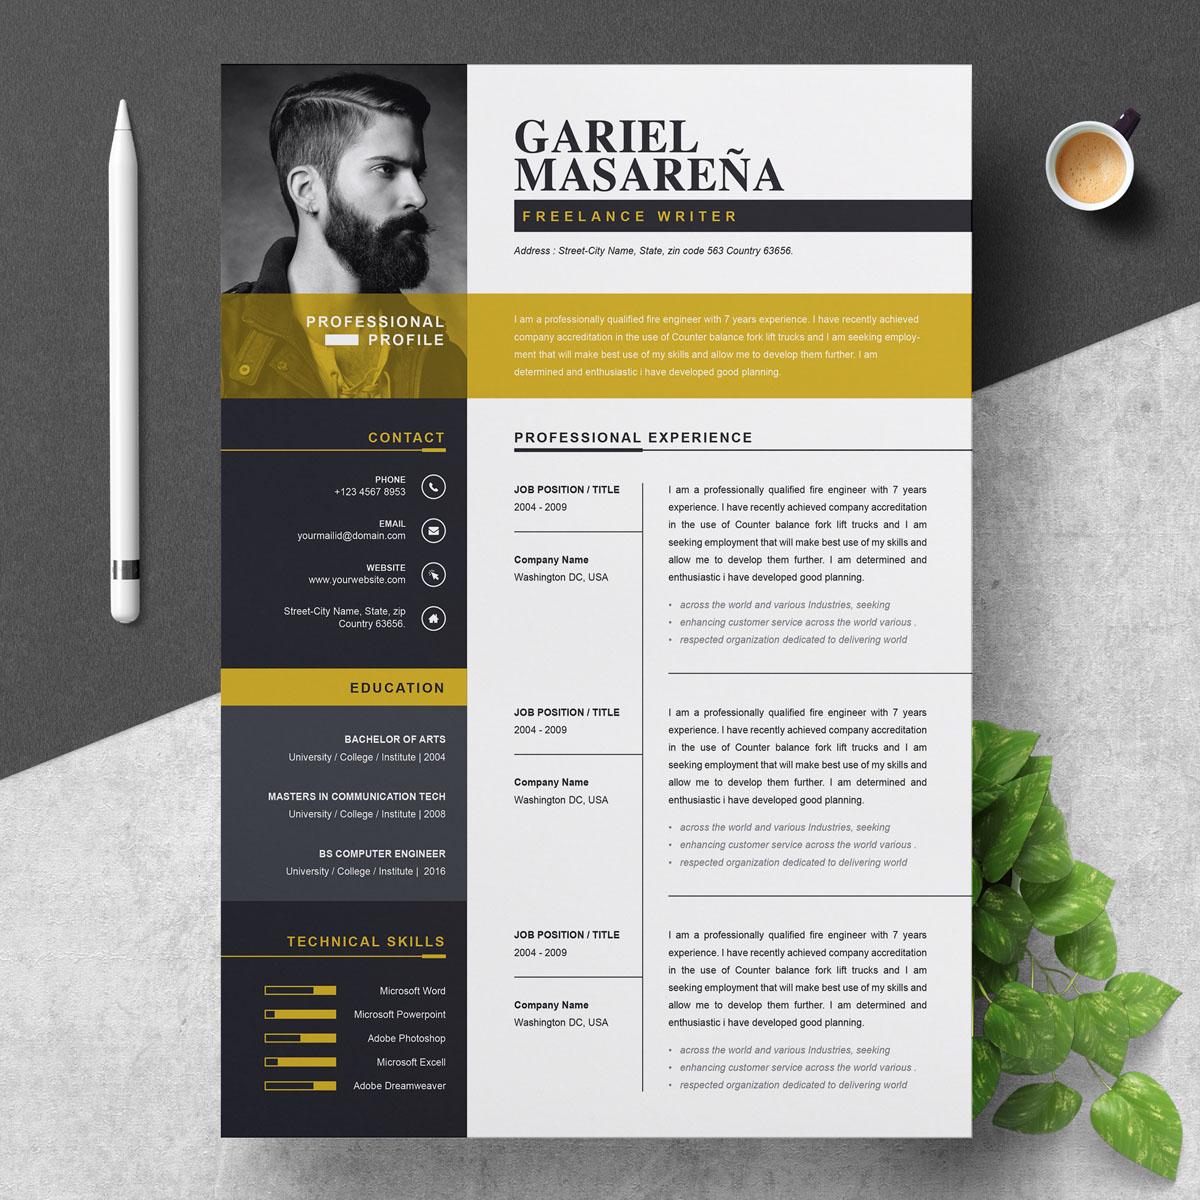 gariel masarena resume template  76948